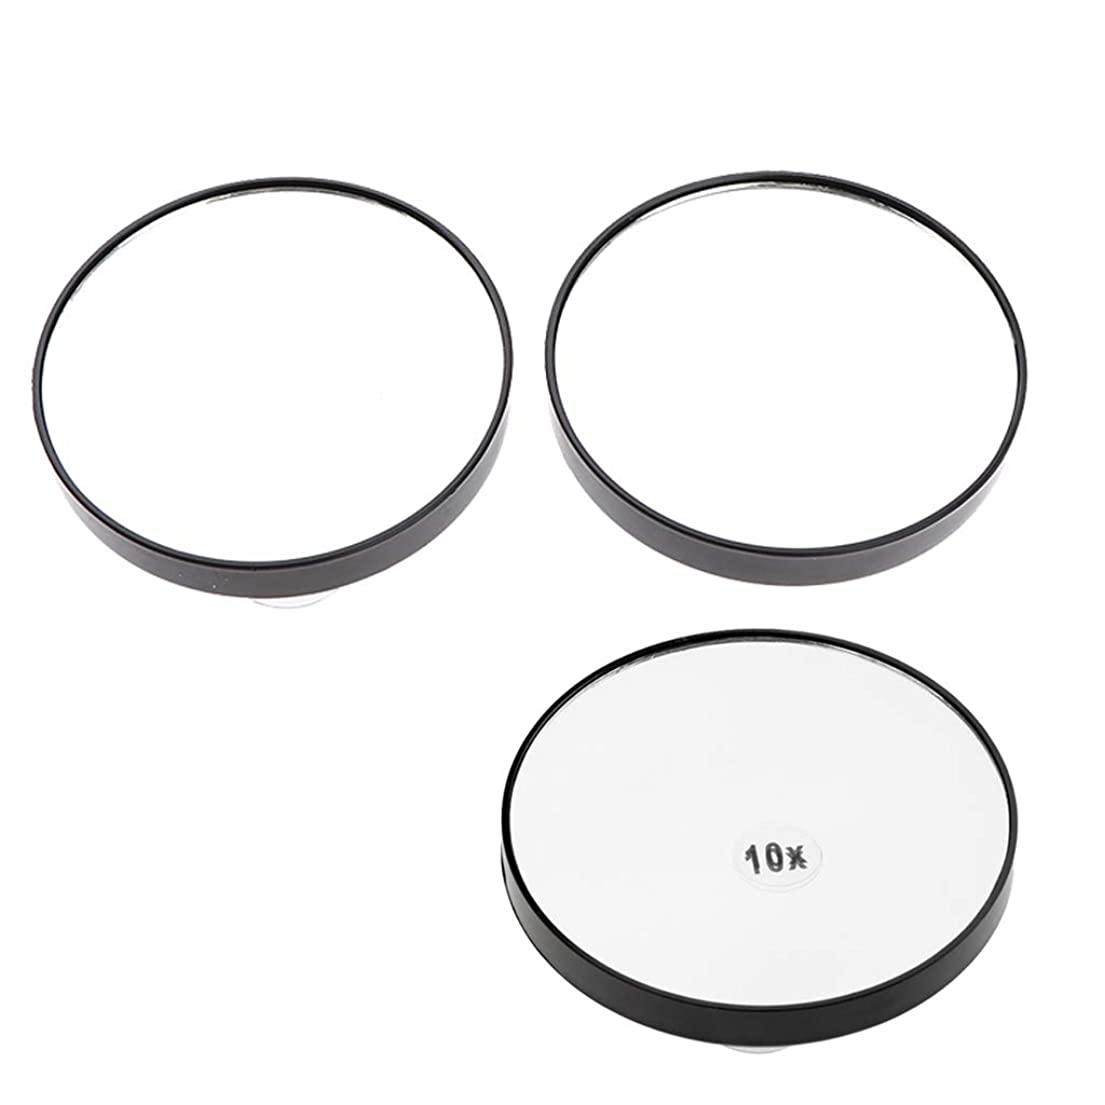 F Fityle メイクミラー 化粧鏡 吸盤付き 浴室化粧鏡 5倍/ 10倍拡大